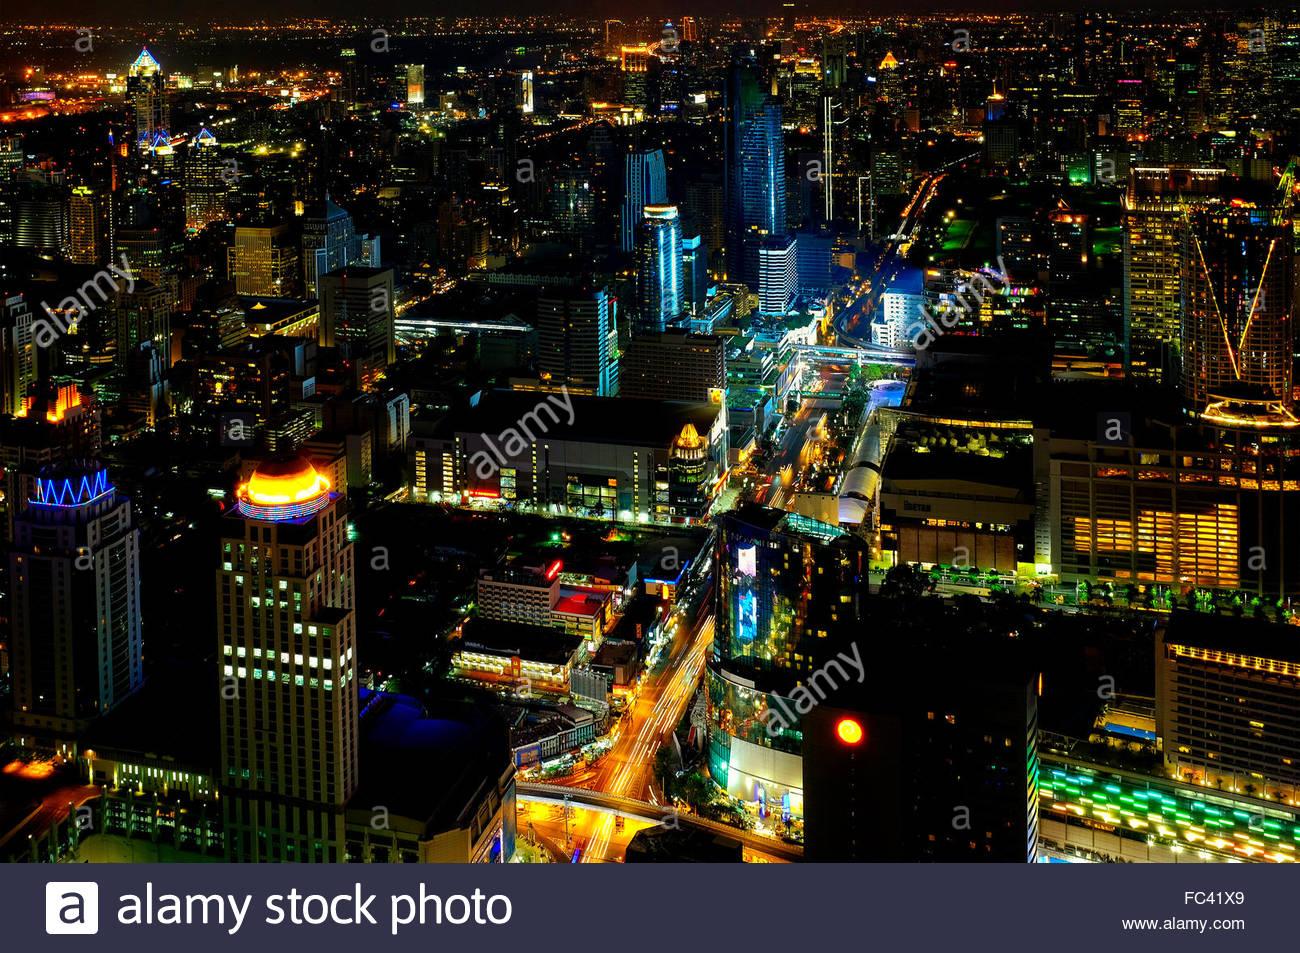 Sur Bangkok la nuit de l'hôtel Baiyoke Sky, Thaïlande Photo Stock